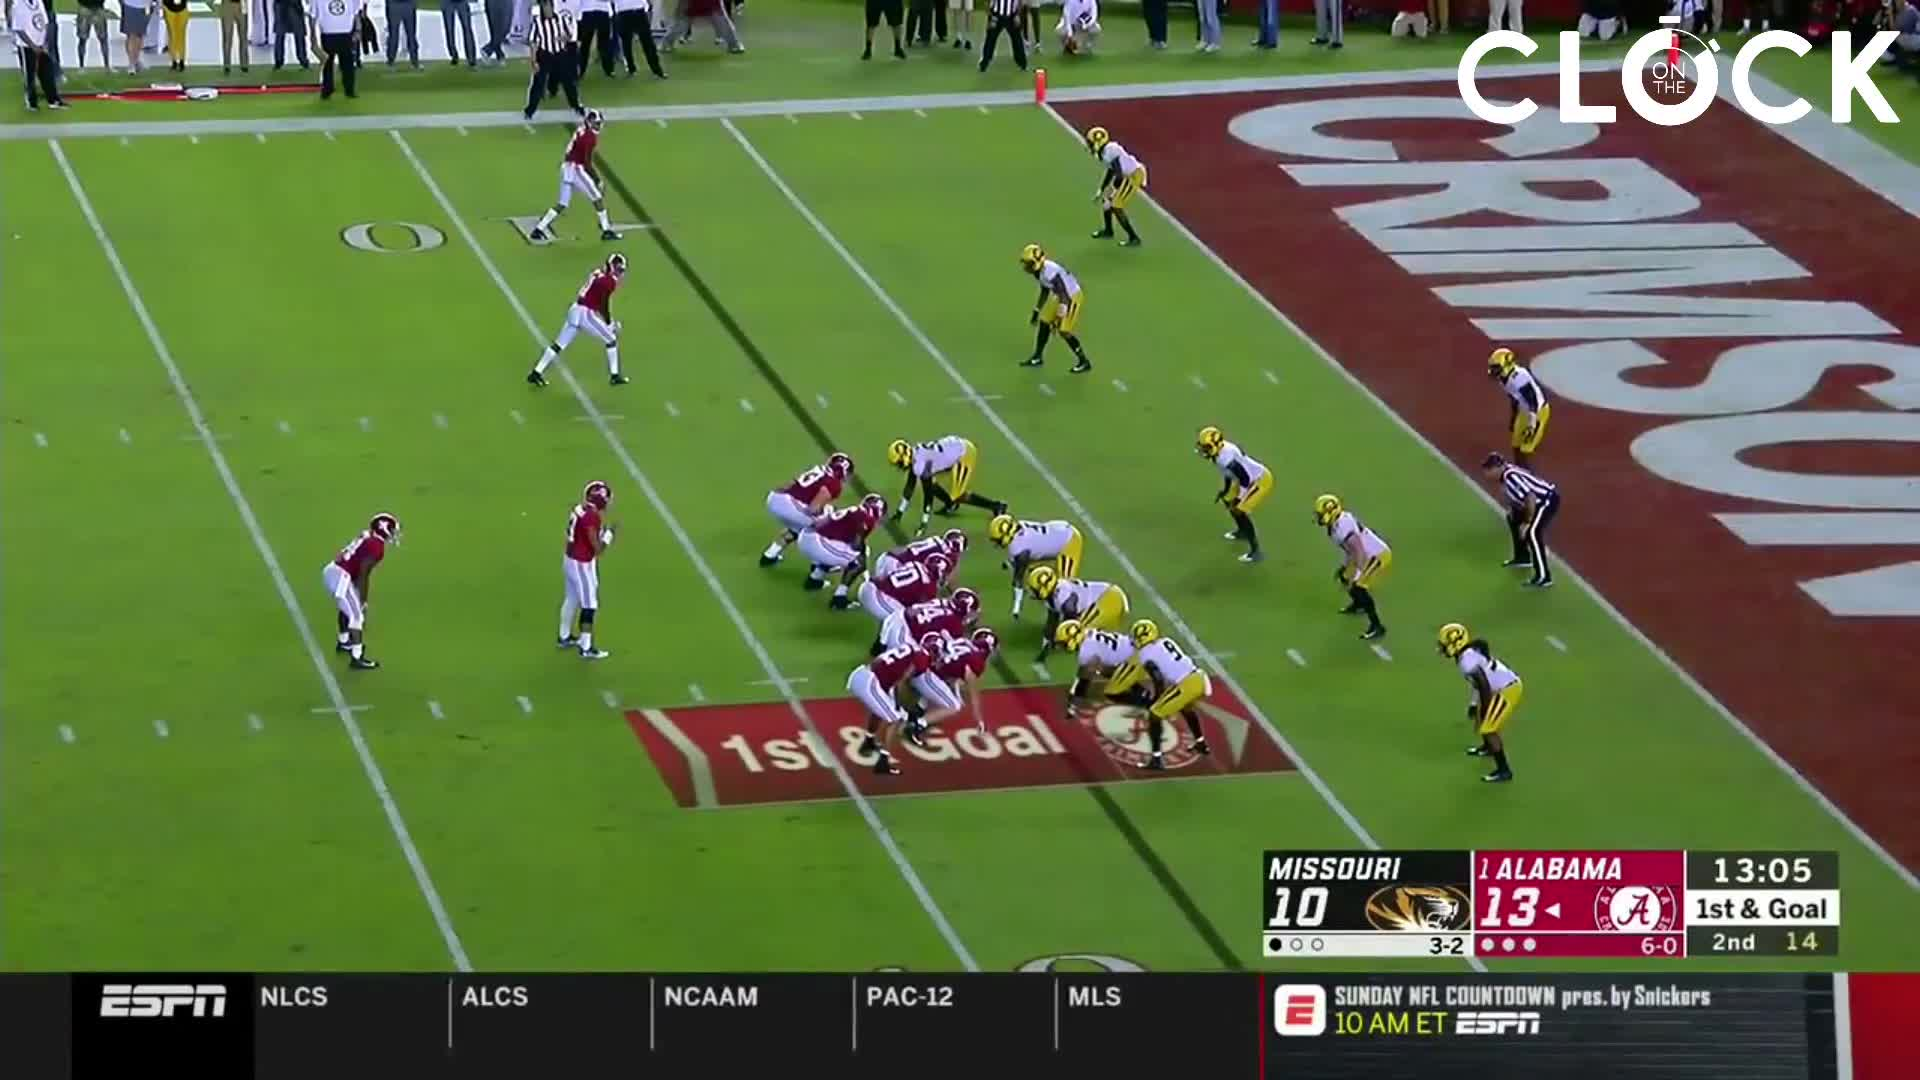 Joao Marcelo Thalhofer, Music, football, Alabama OL vs Missouri 2018 GIFs